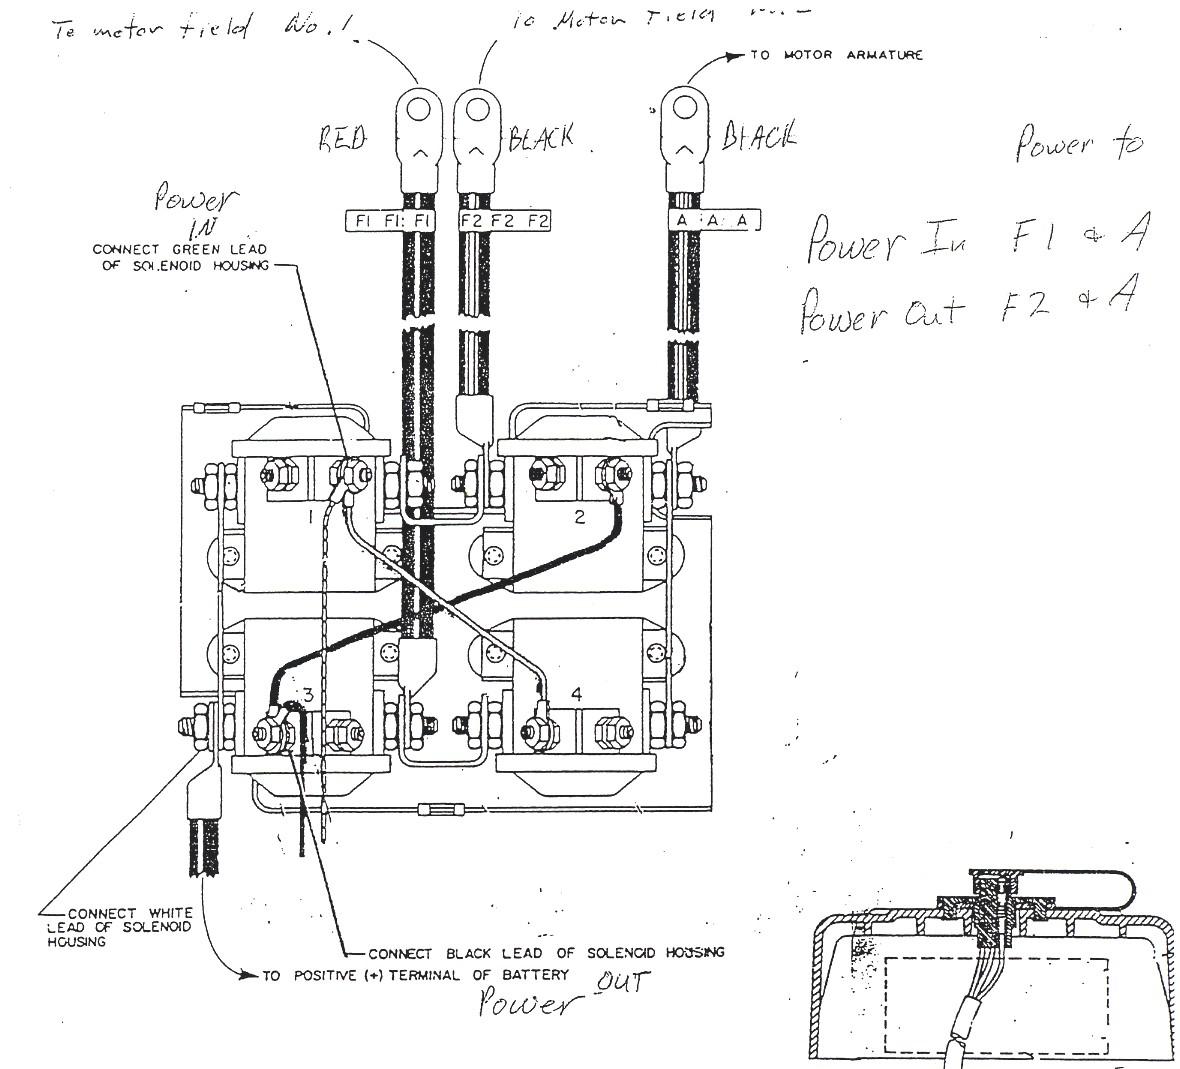 Warn Winch Solenoid Wiring - Wiring Diagrams Hubs - Western Unimount Wiring Diagram